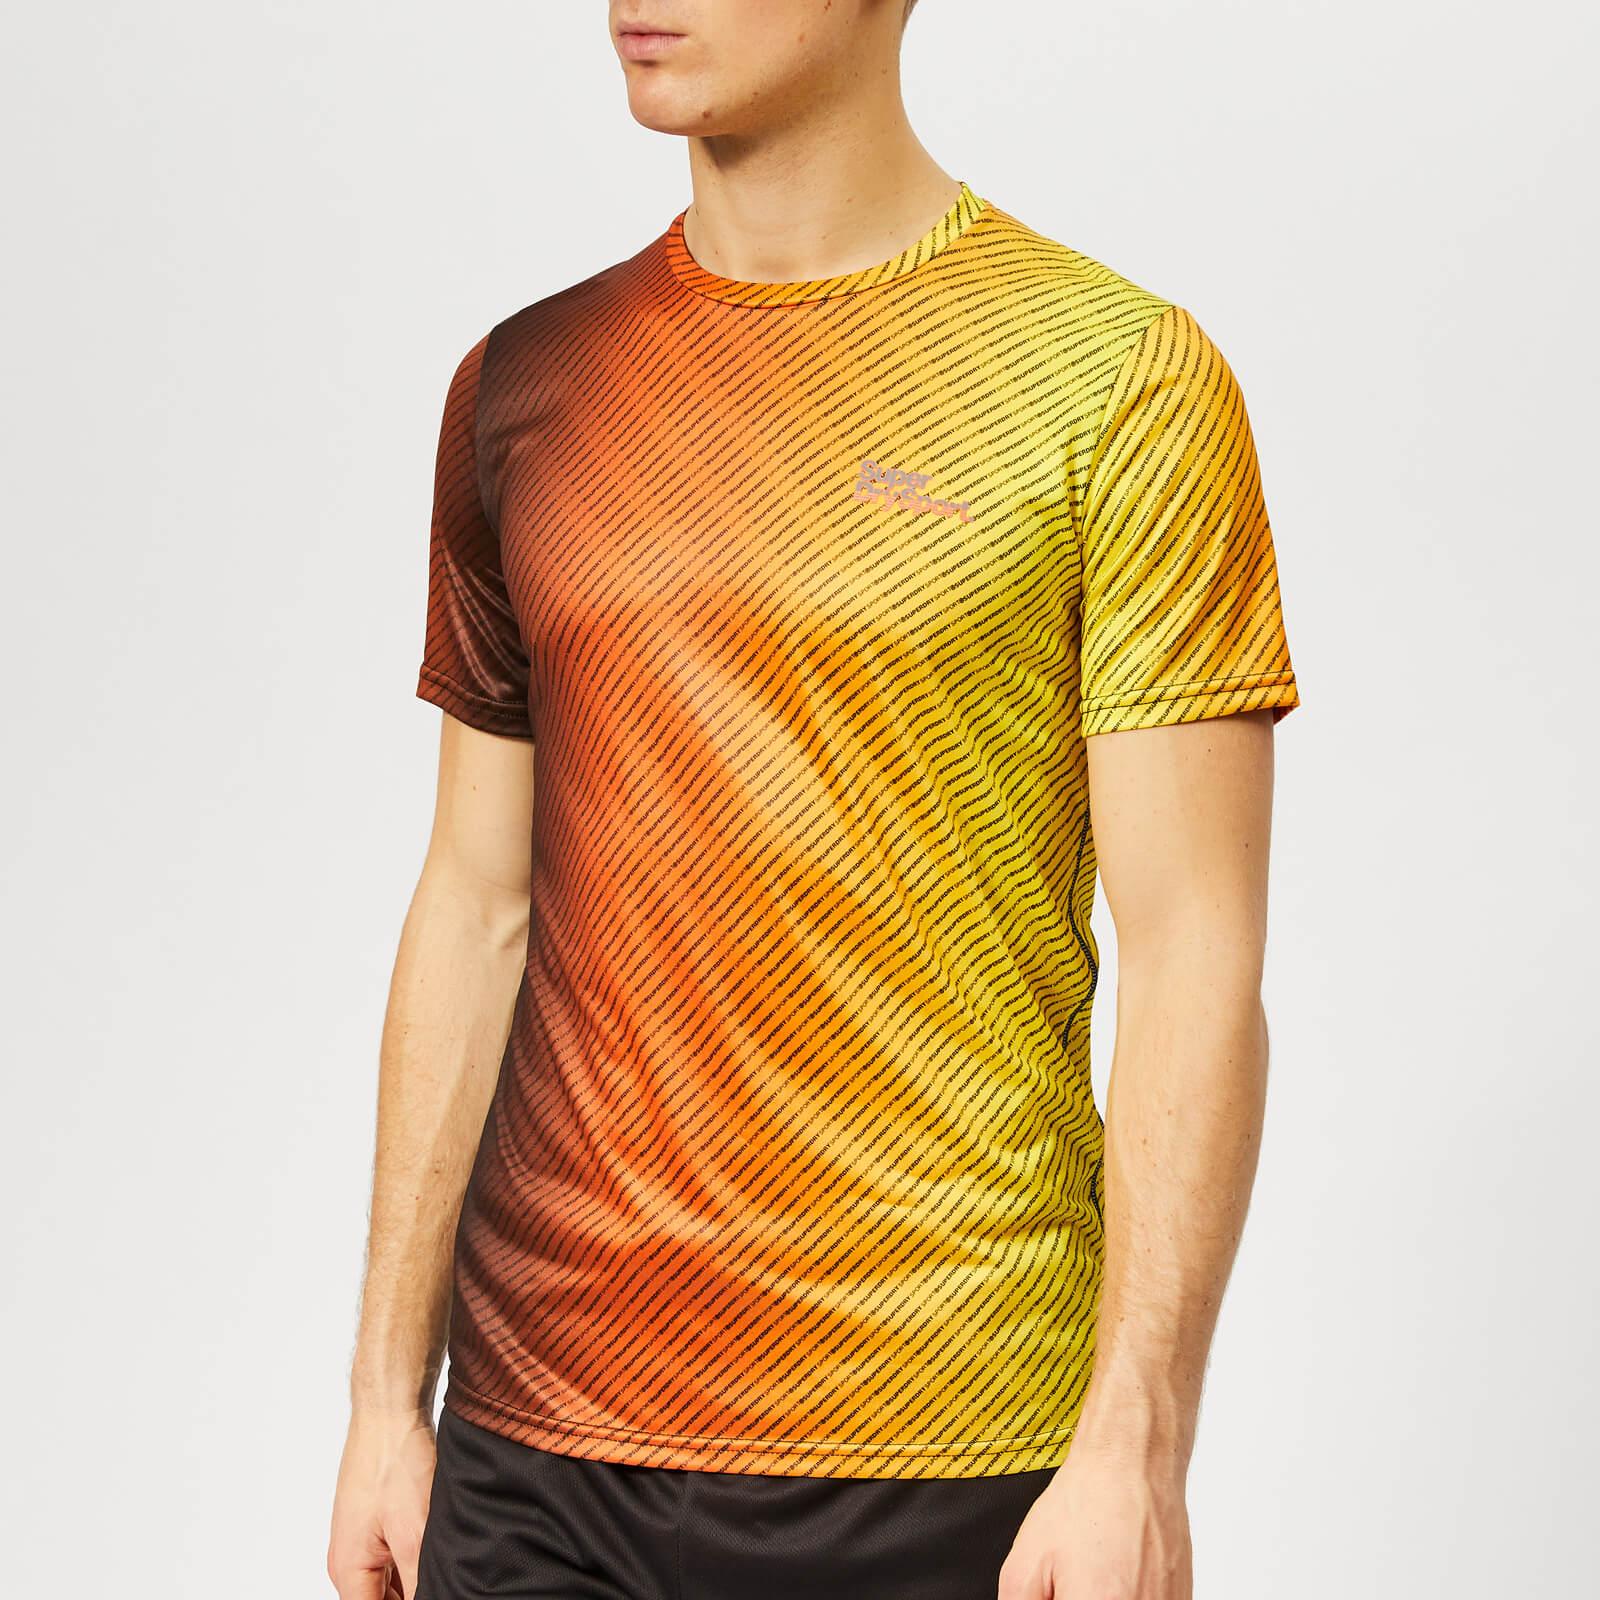 Superdry Sport Men's Active All Over Print T-Shirt - Fluro Orange Ombre - S - Orange